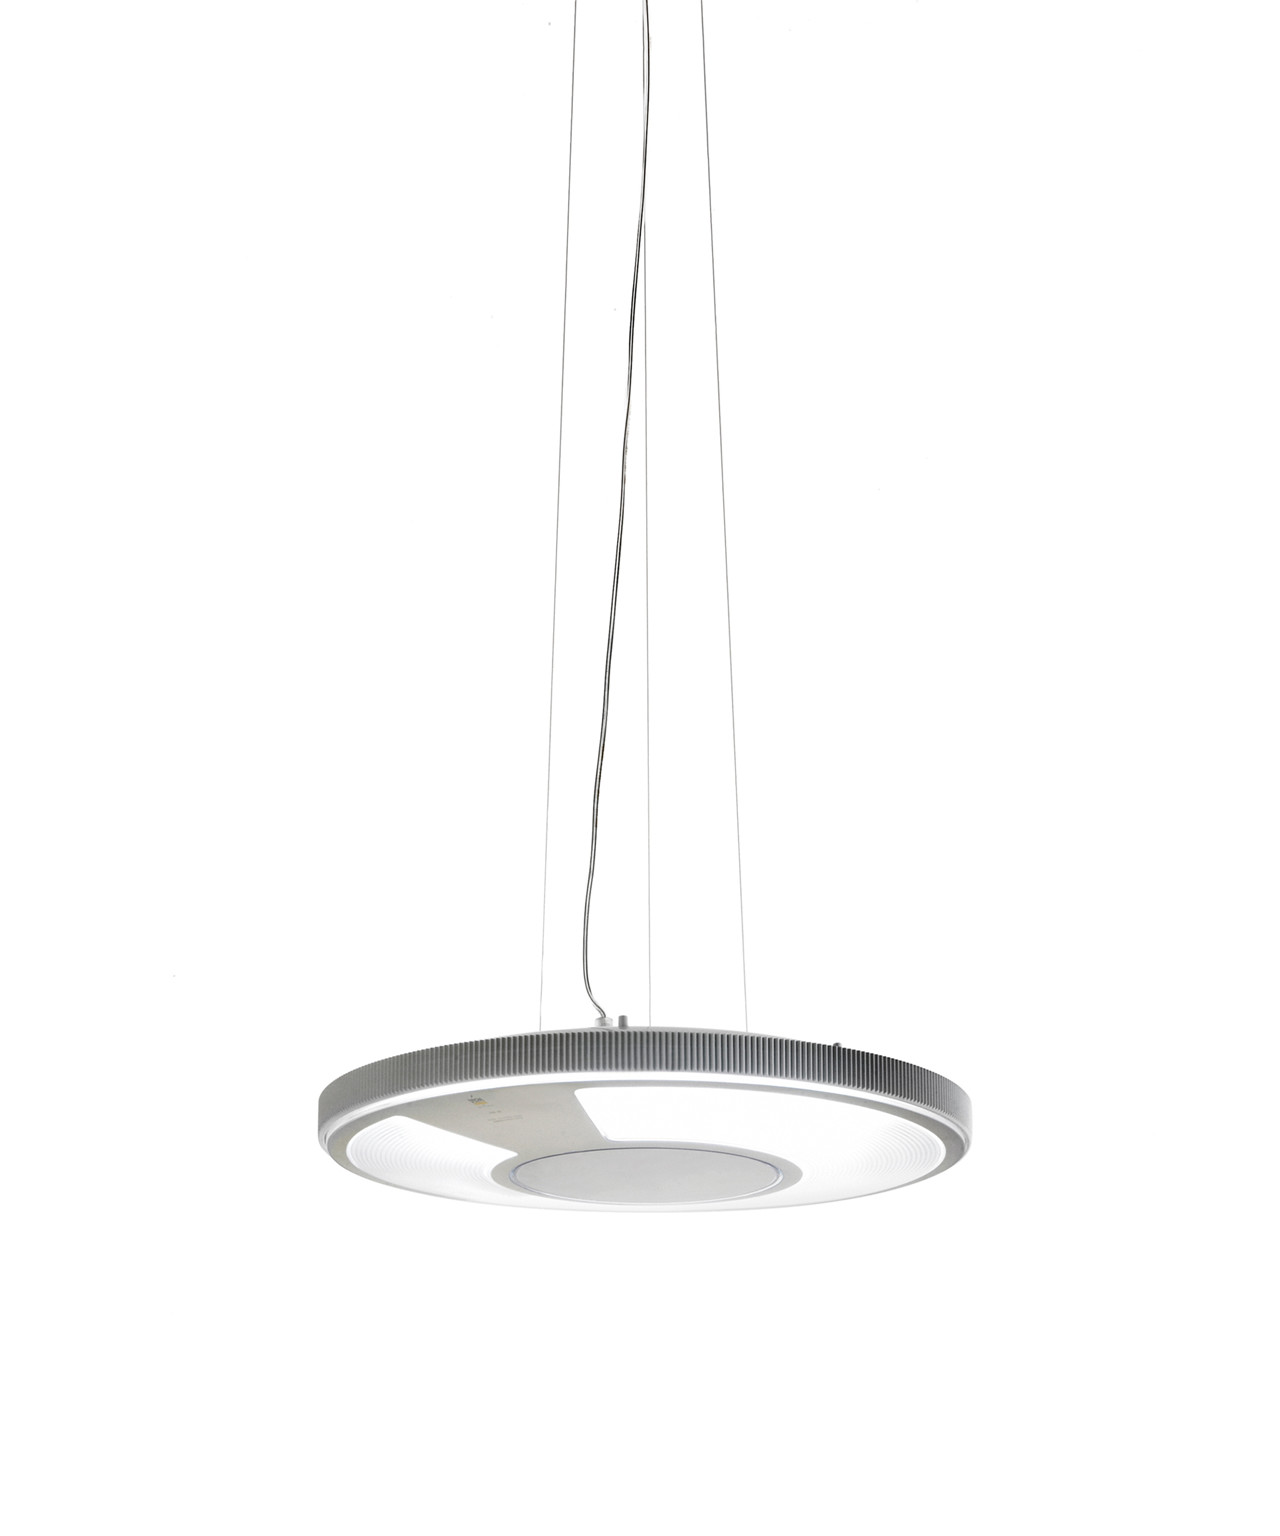 Image of   LightDisc Pendel - Luceplan